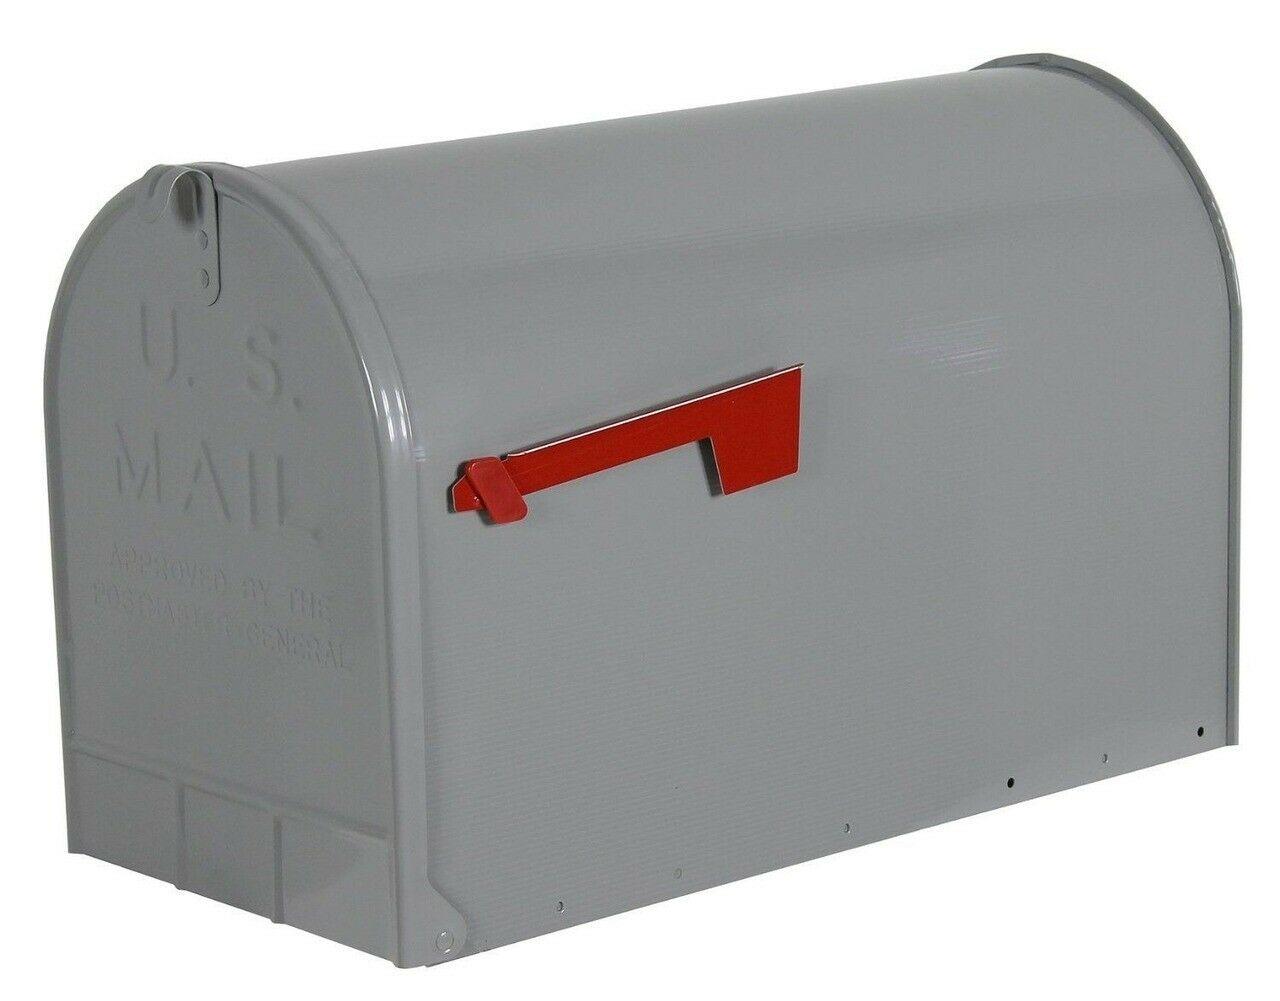 Solar ST200B00 Group Jumbo Steel Rural Mailbox Black